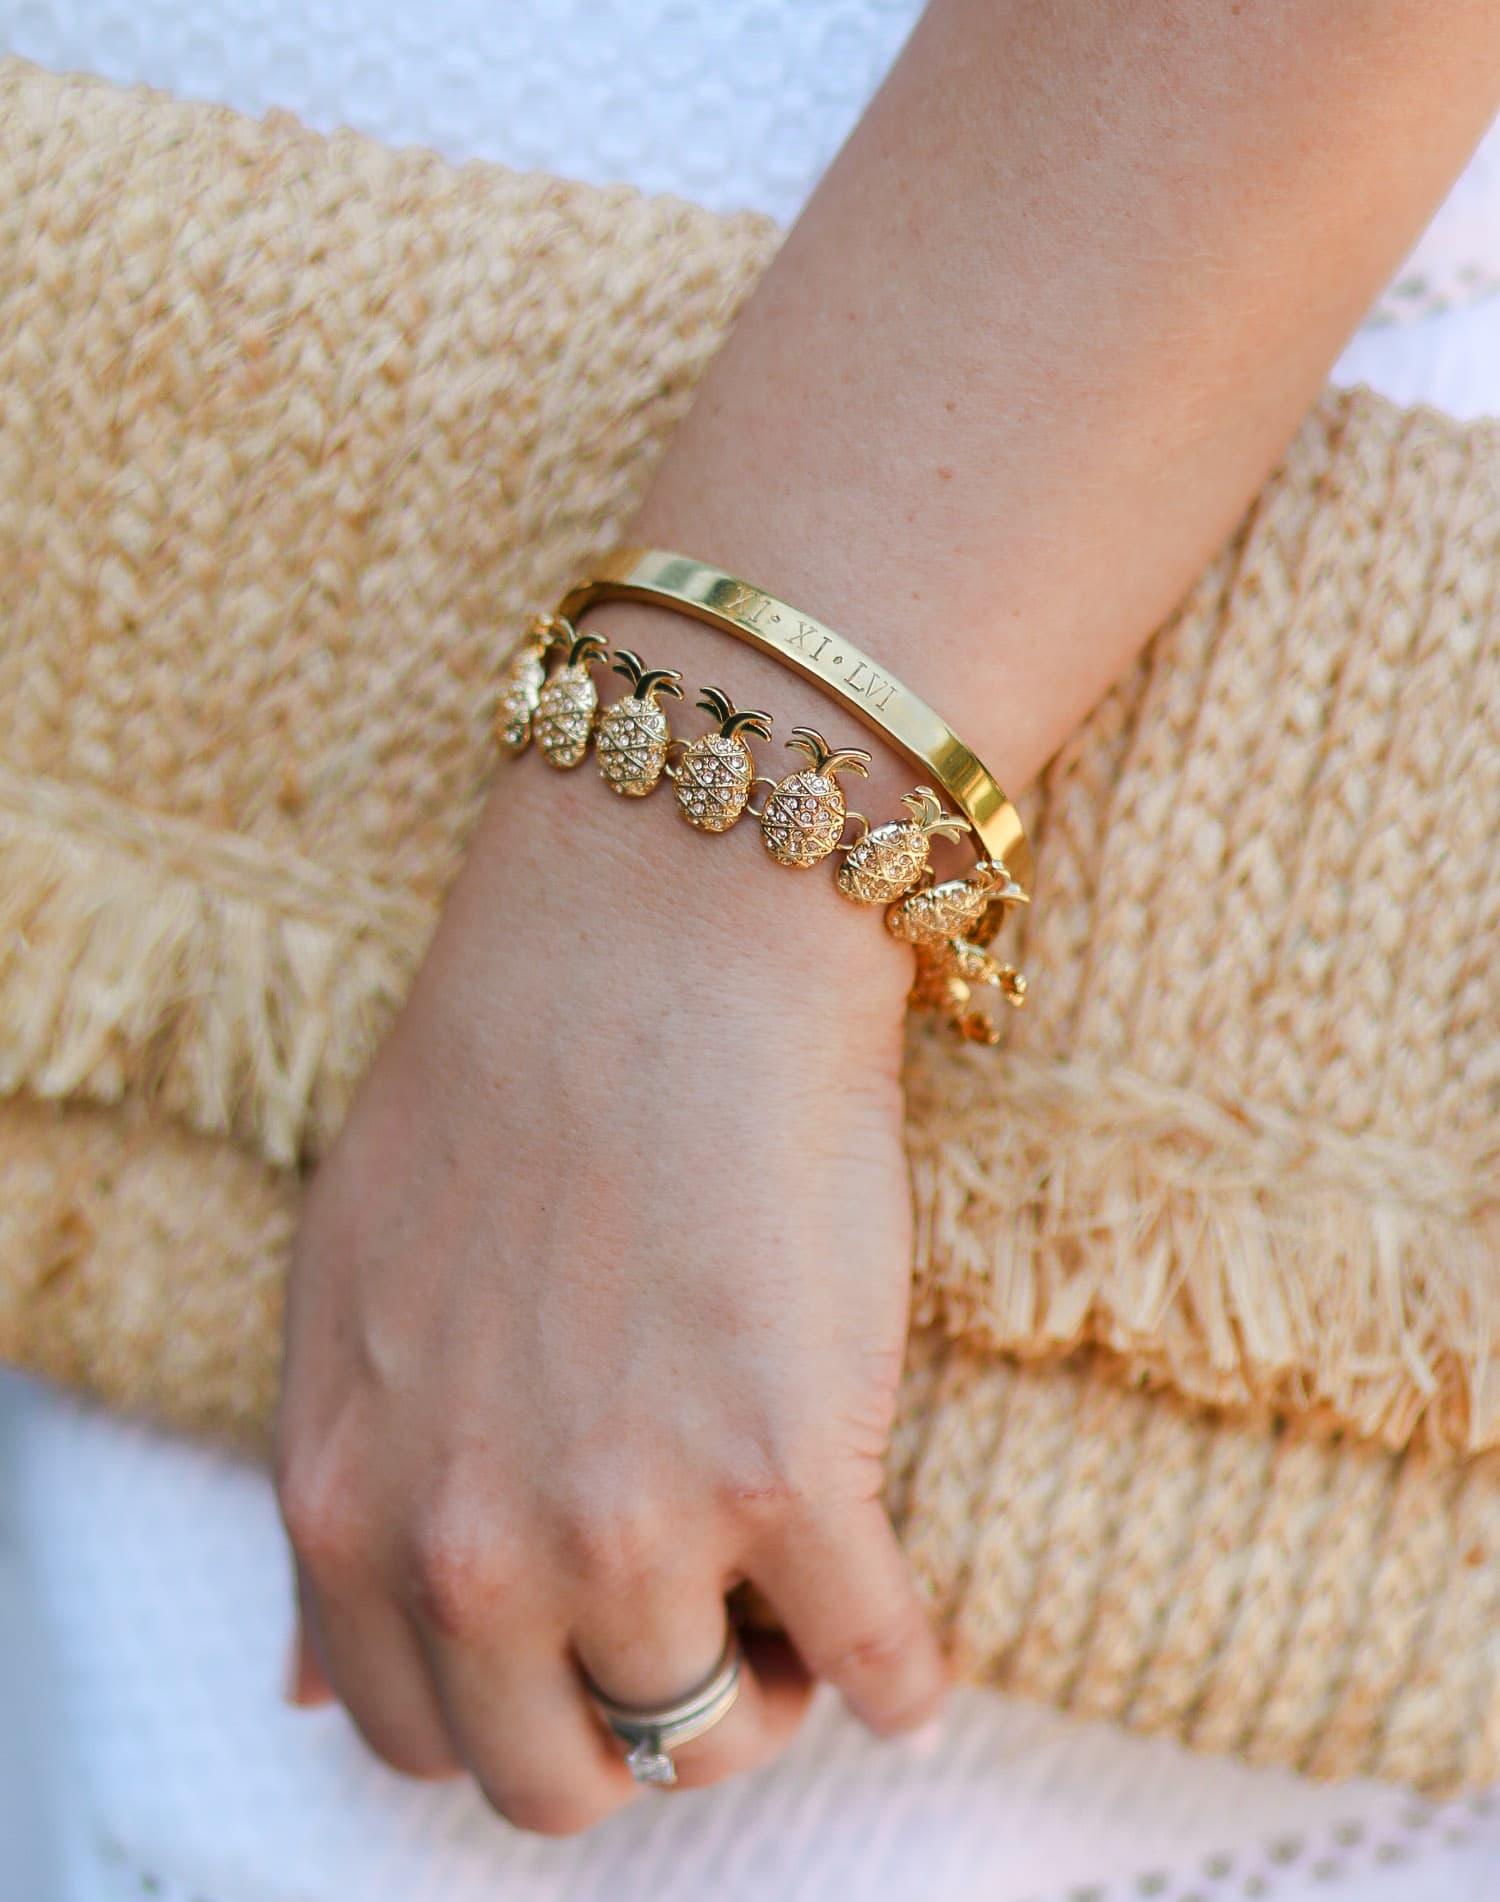 taudrey-roman-numeral-engaged-bracelet-baublebar-gold-pineapple-bracelet-3134